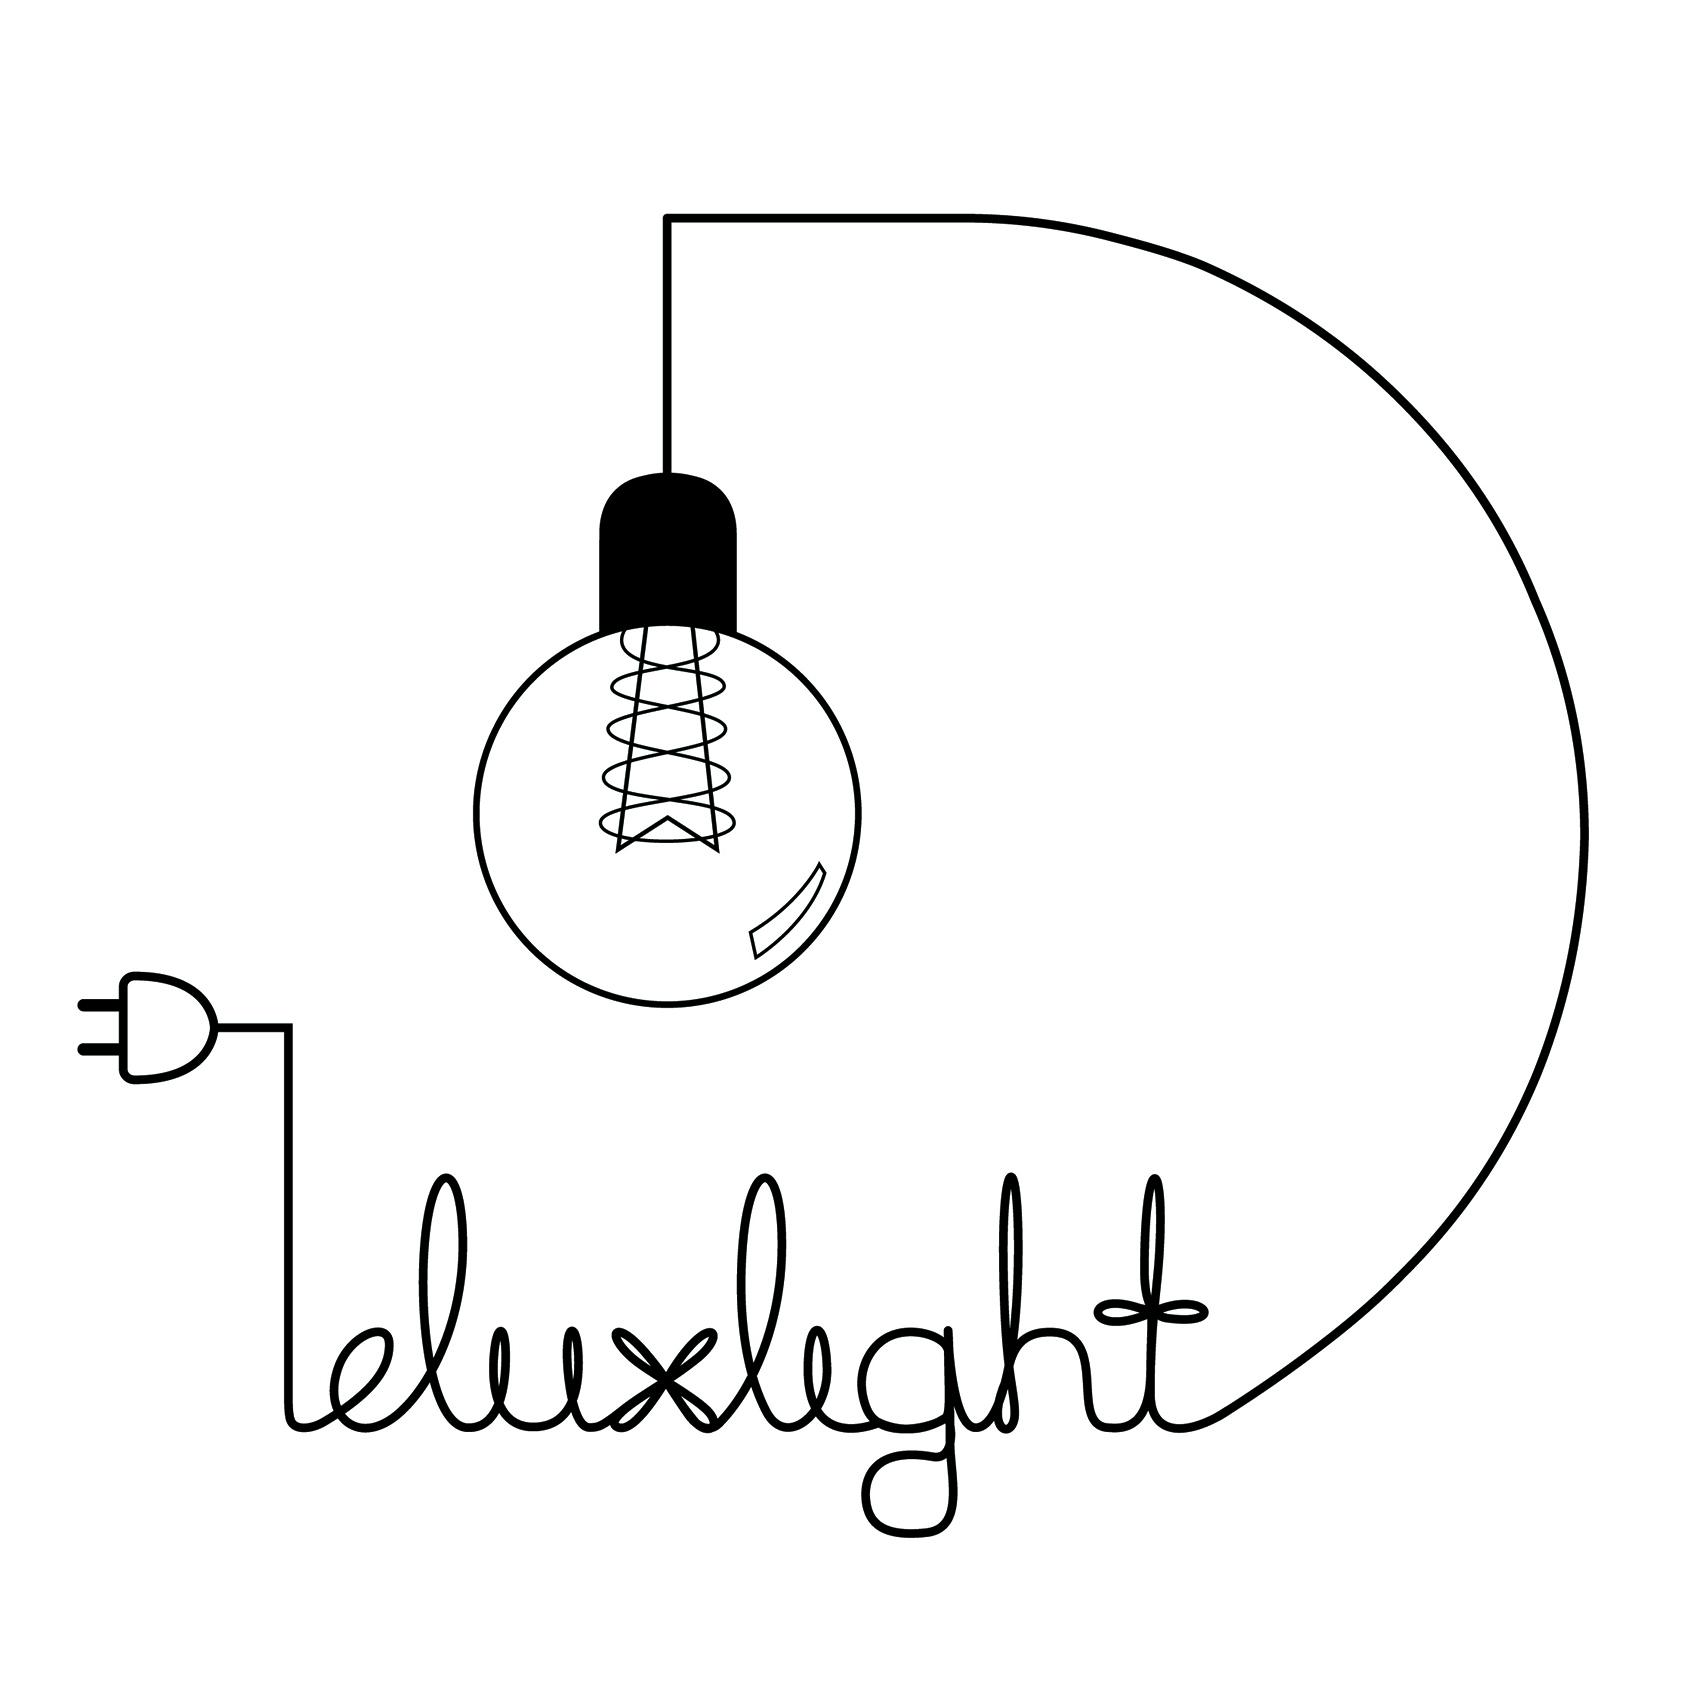 deluxlight-logo_big